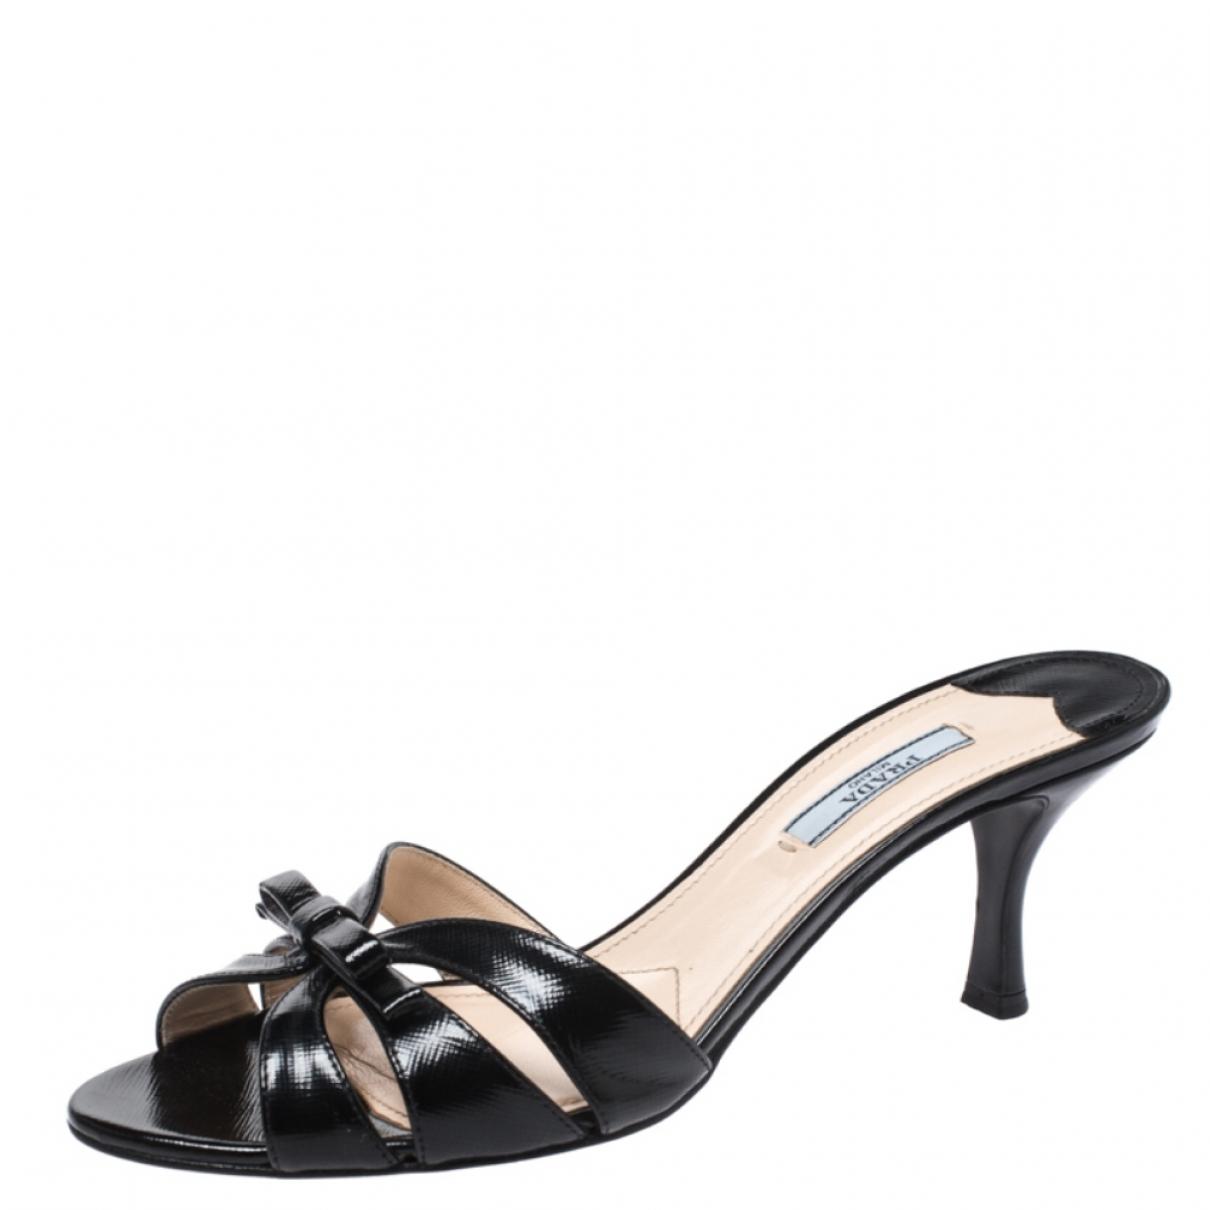 Prada \N Black Patent leather Sandals for Women 7.5 US